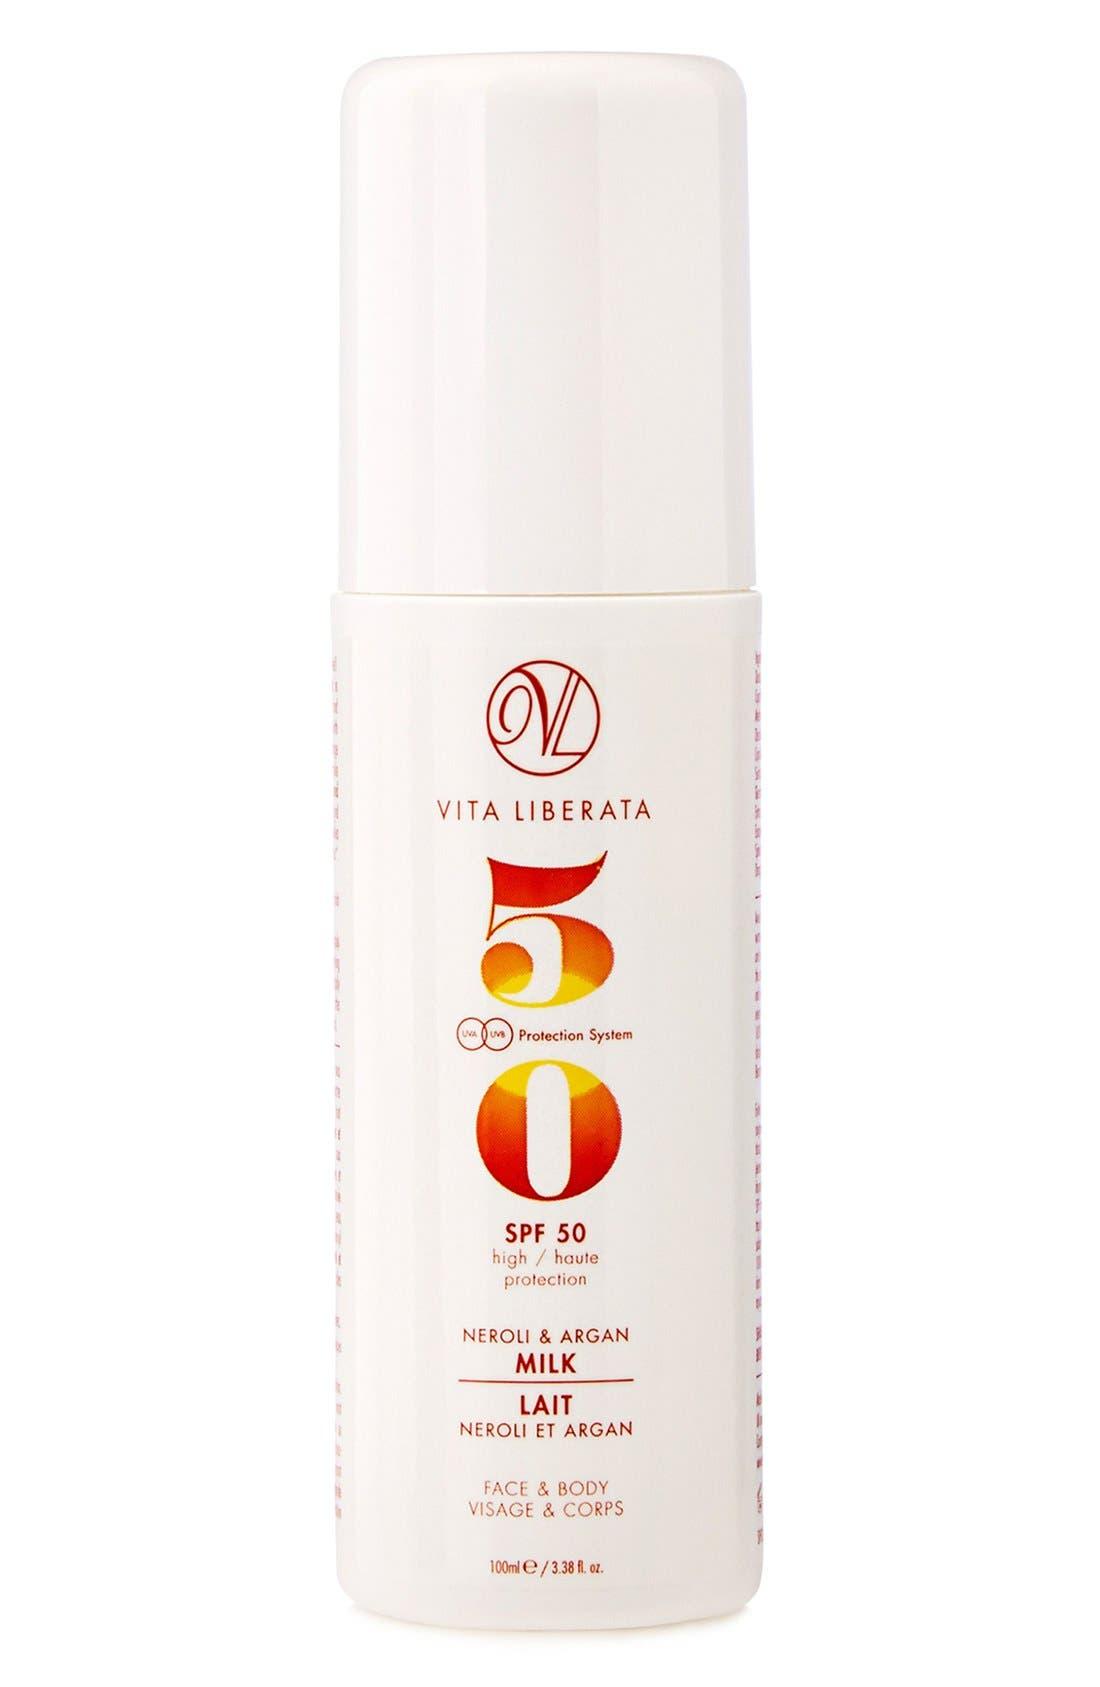 Neroli & Argan Milk for Face & Body SPF 50,                         Main,                         color,